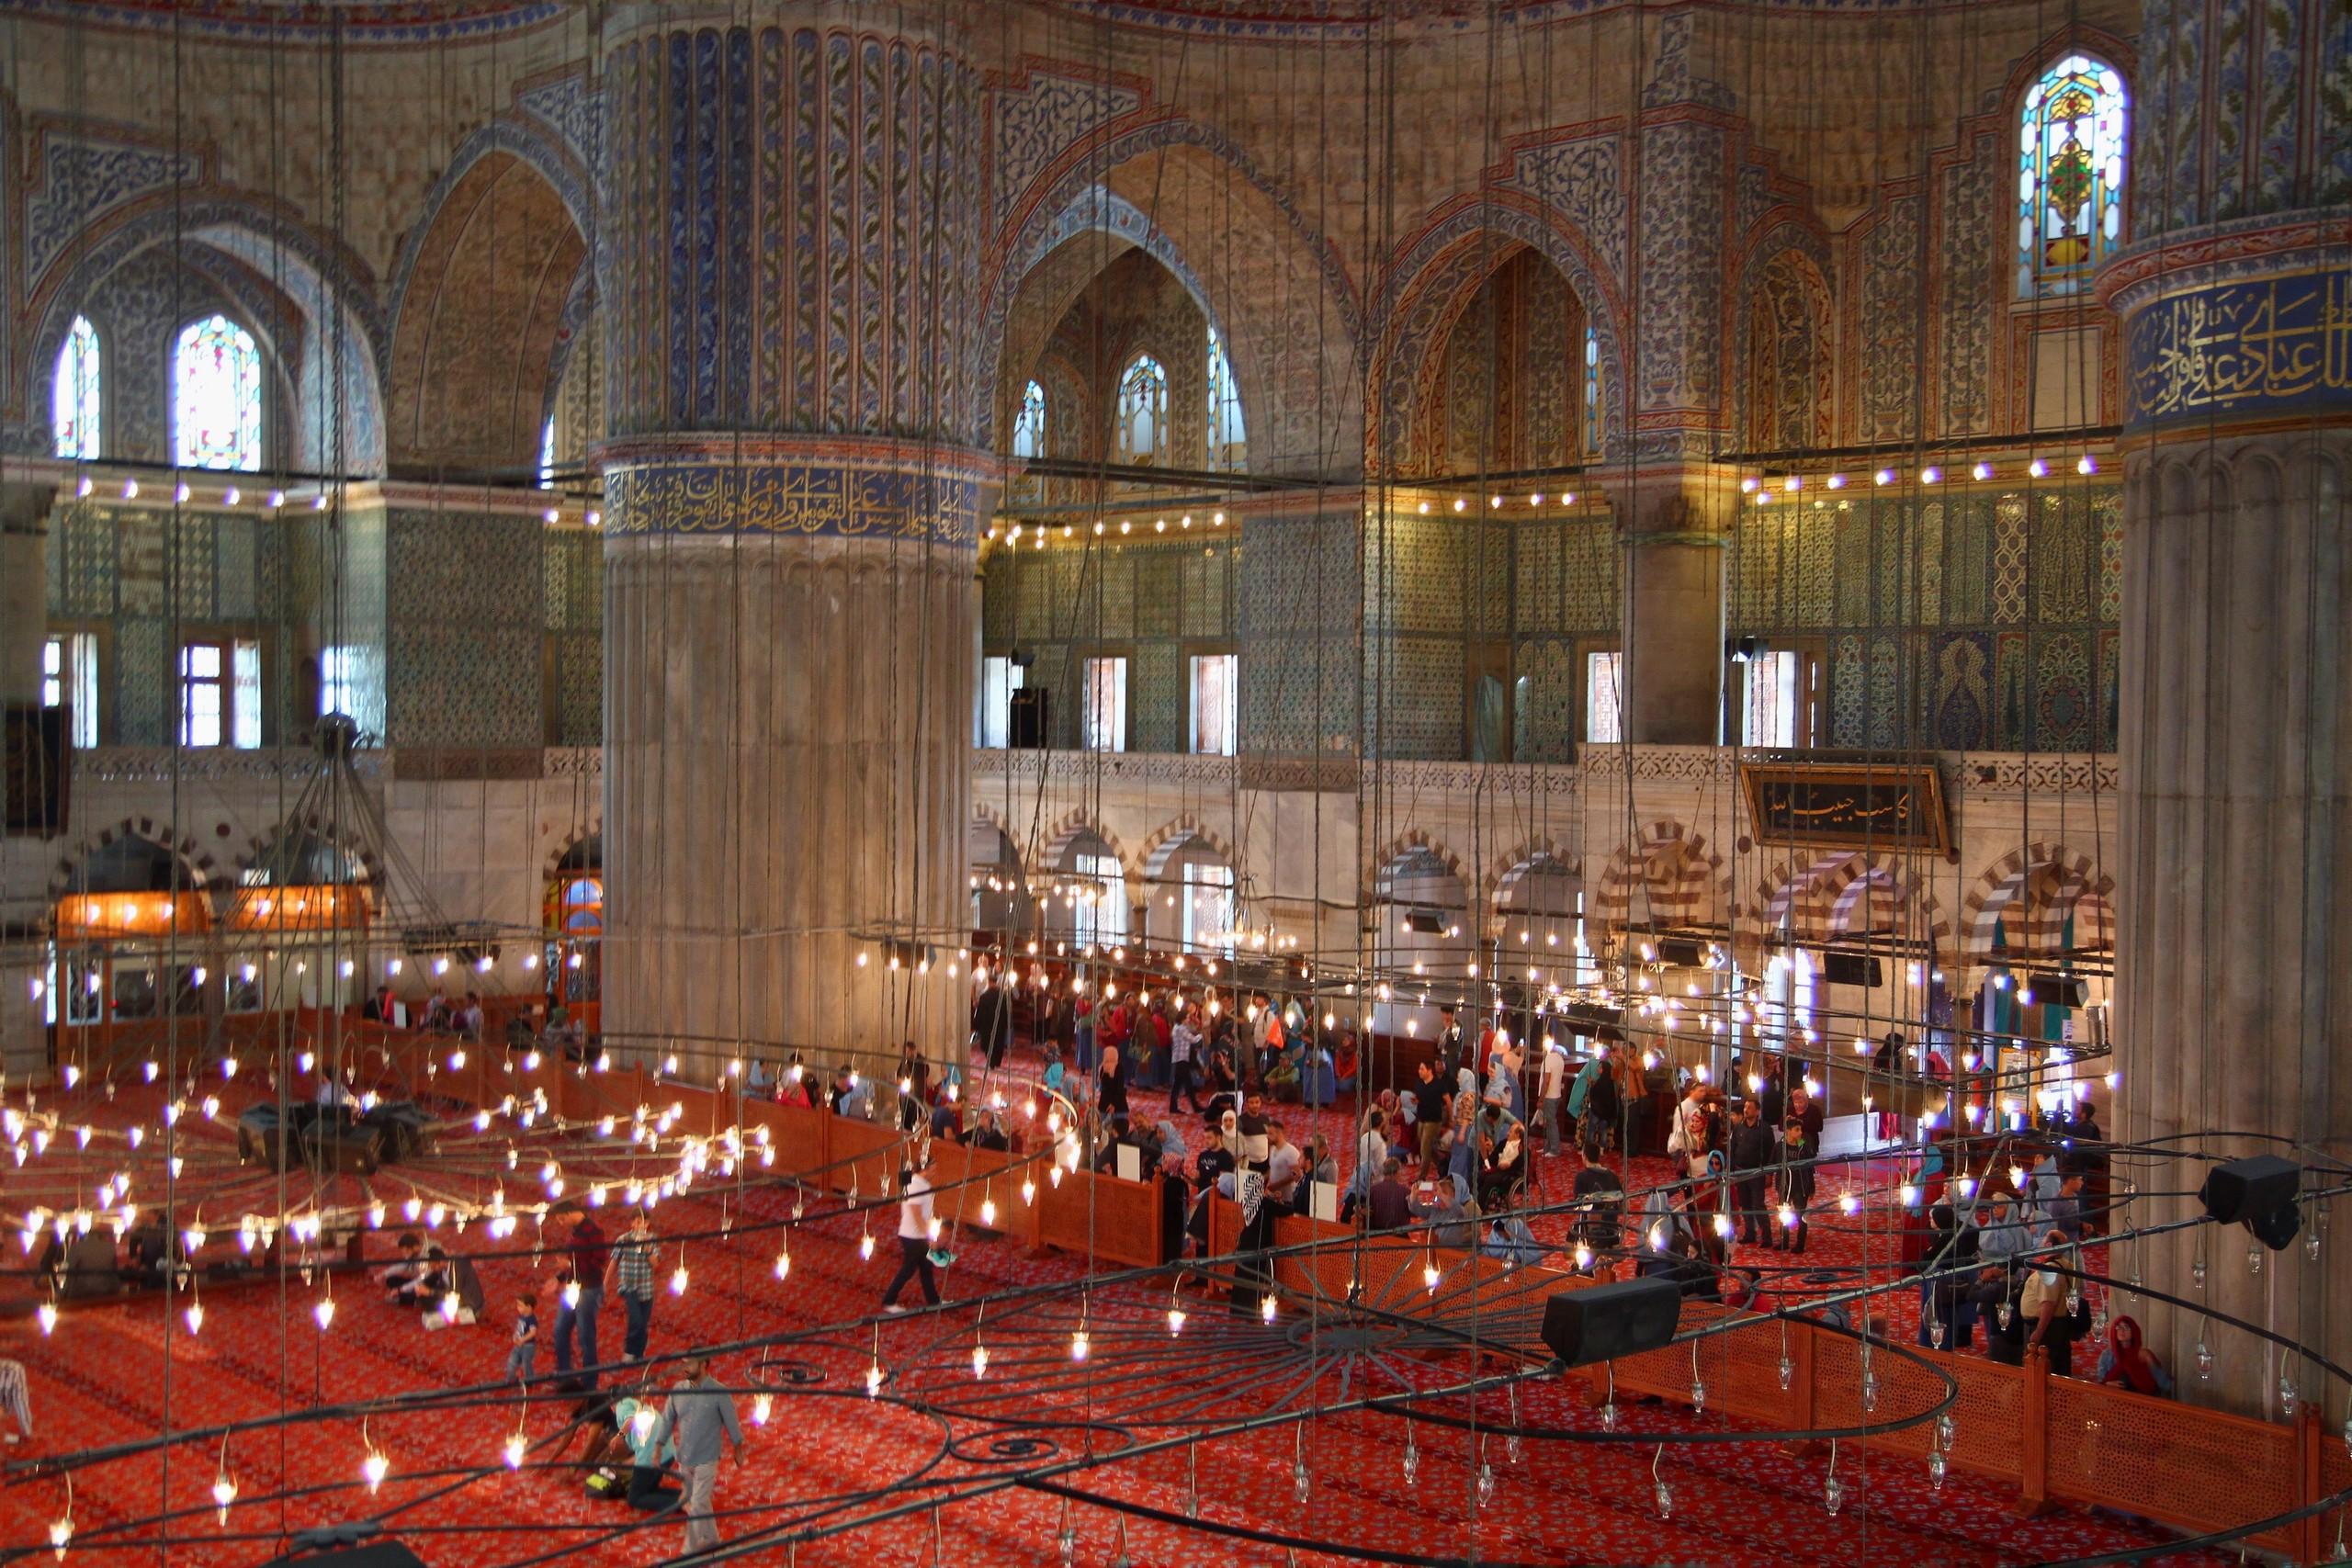 Pırlantadan Kubbeler #5: Sultanahmed - govQ0R - Pırlantadan Kubbeler #5: Sultanahmed